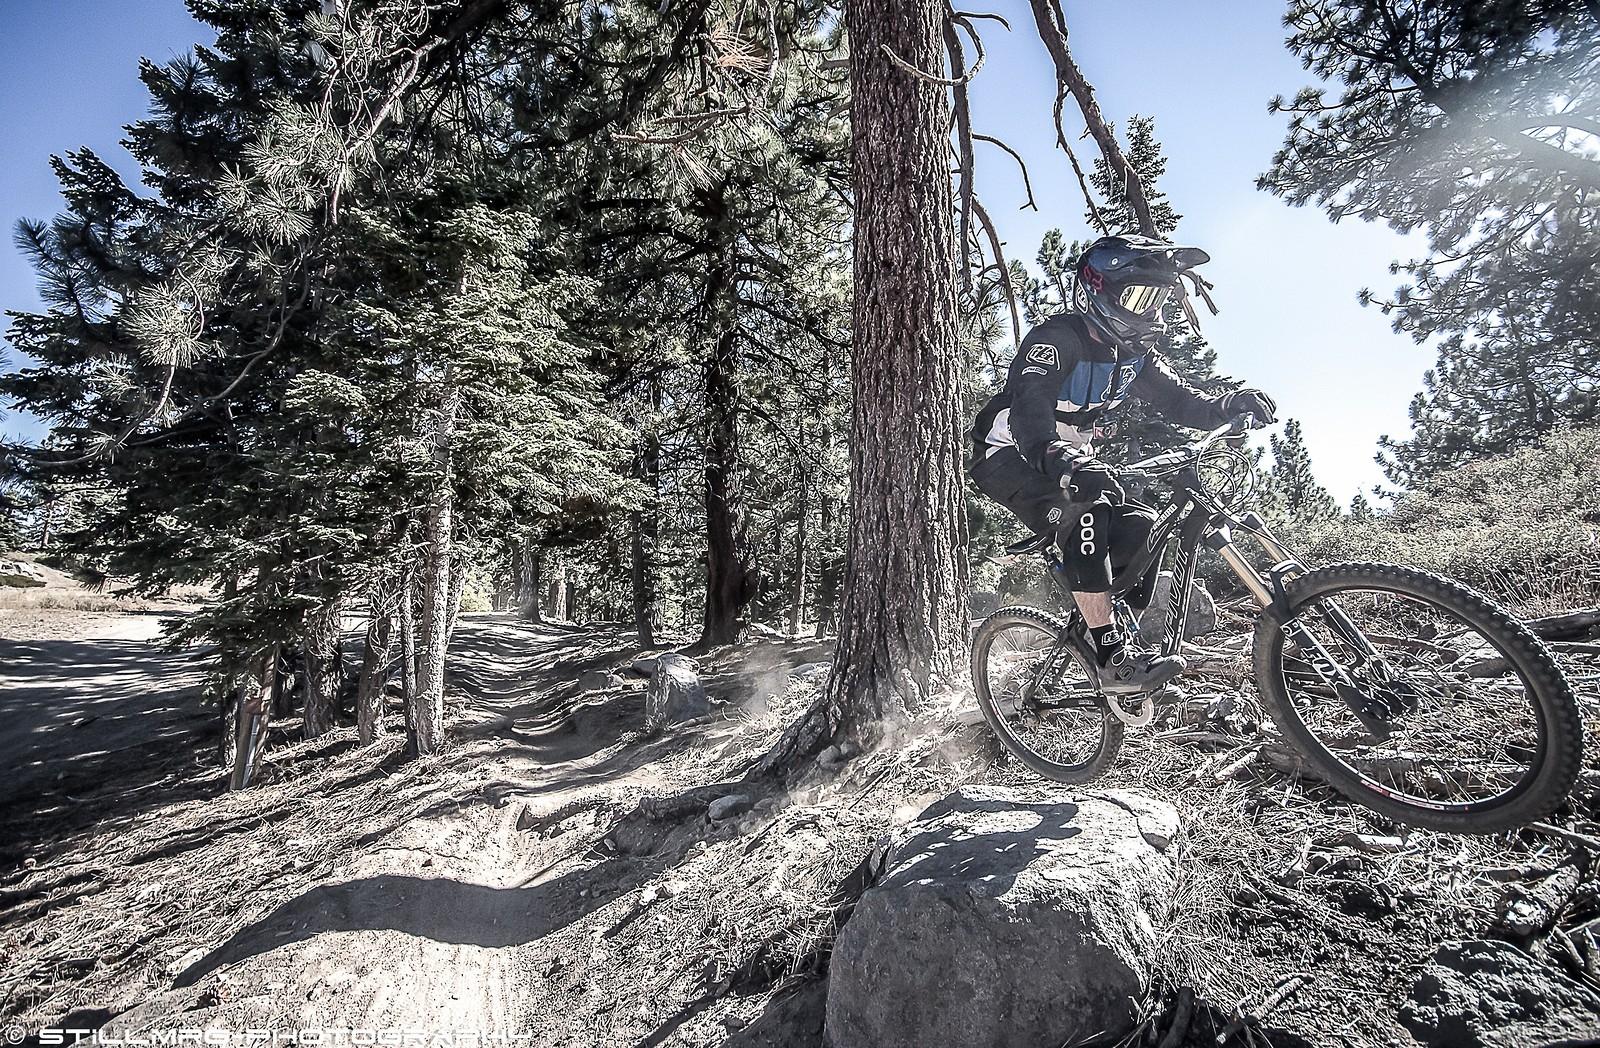 A little Technical shortcut is always better. - Stillmrg Photography - Mountain Biking Pictures - Vital MTB